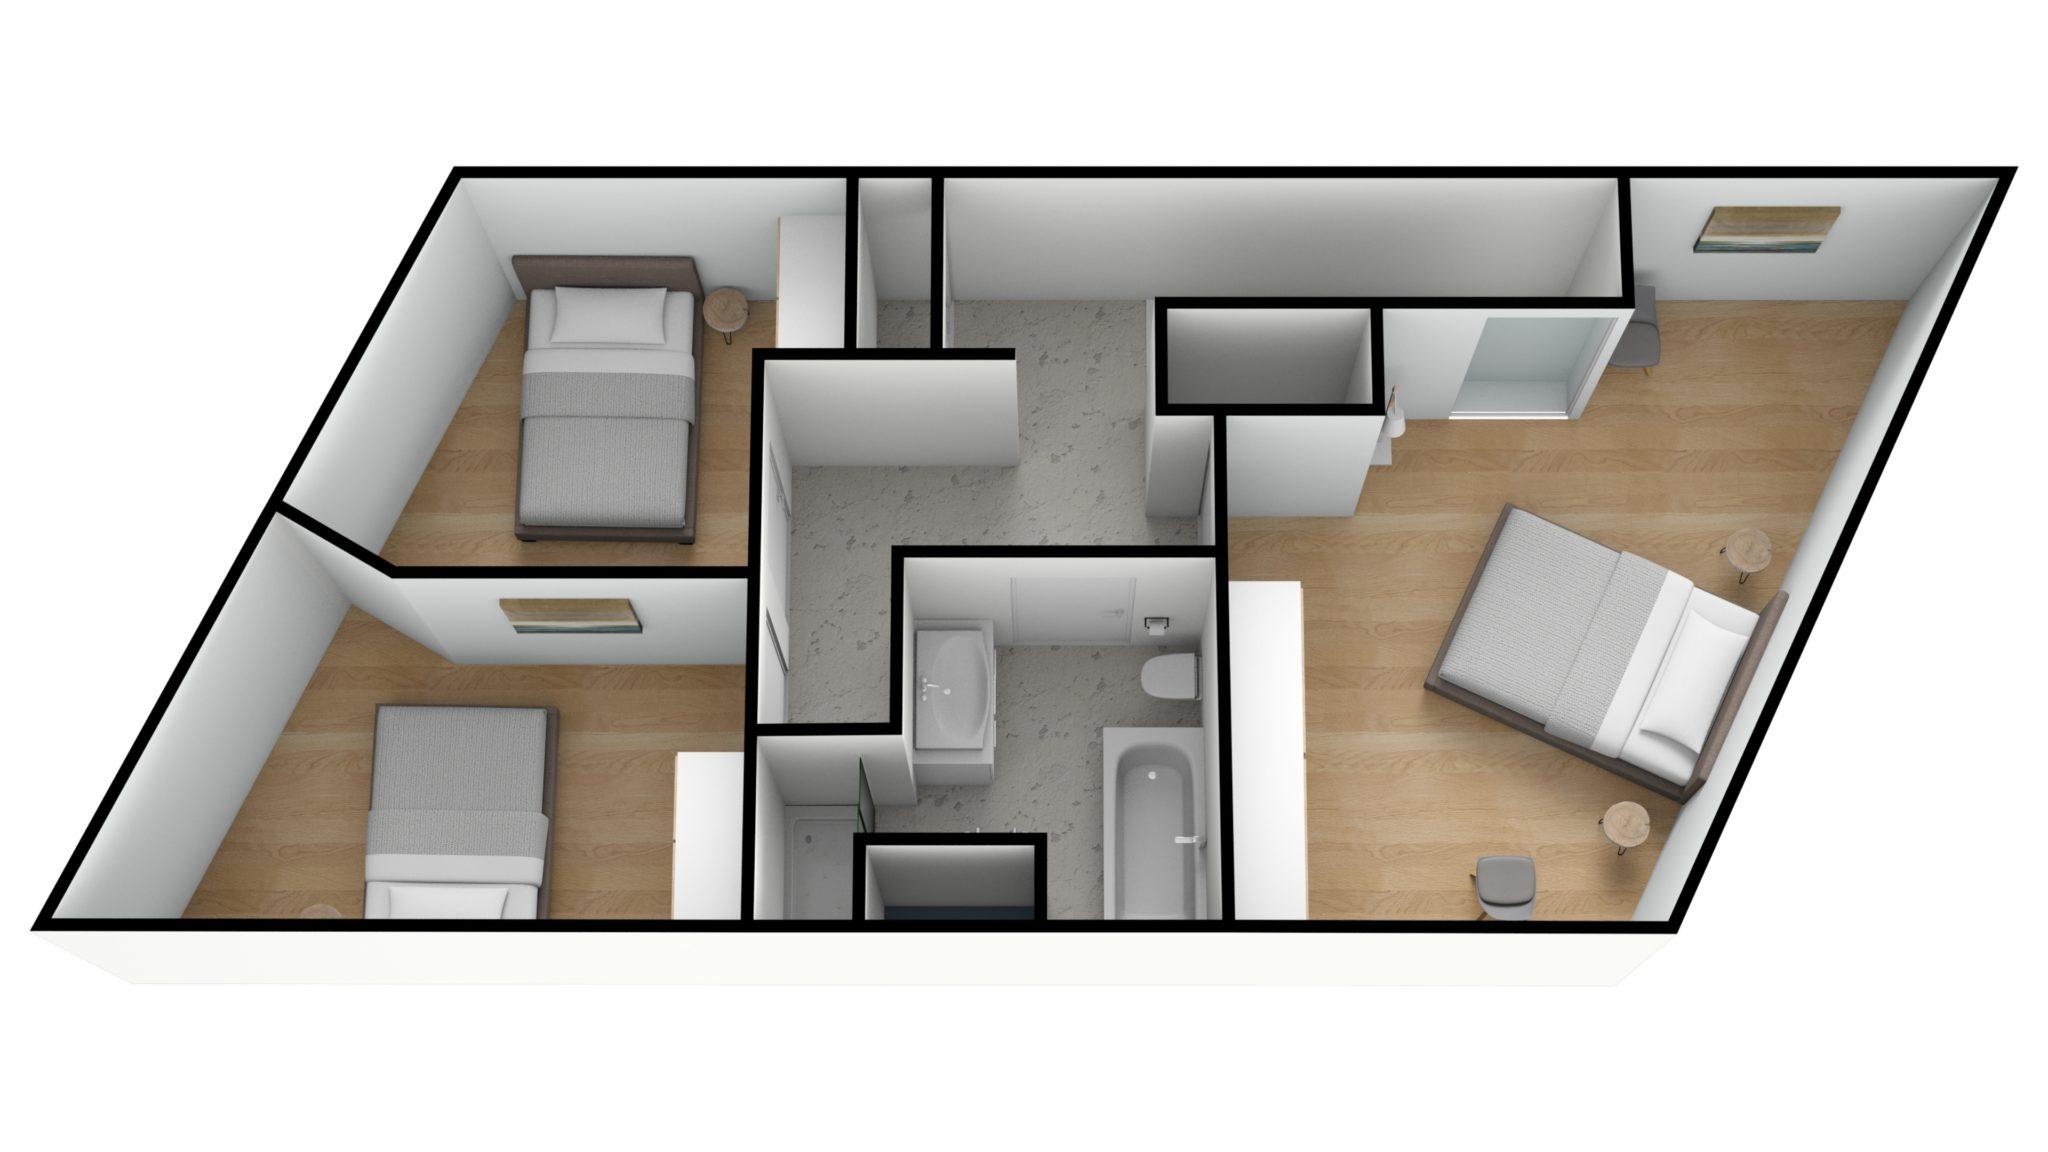 Astridlaan duplex 2e verdiep 3D TILTED